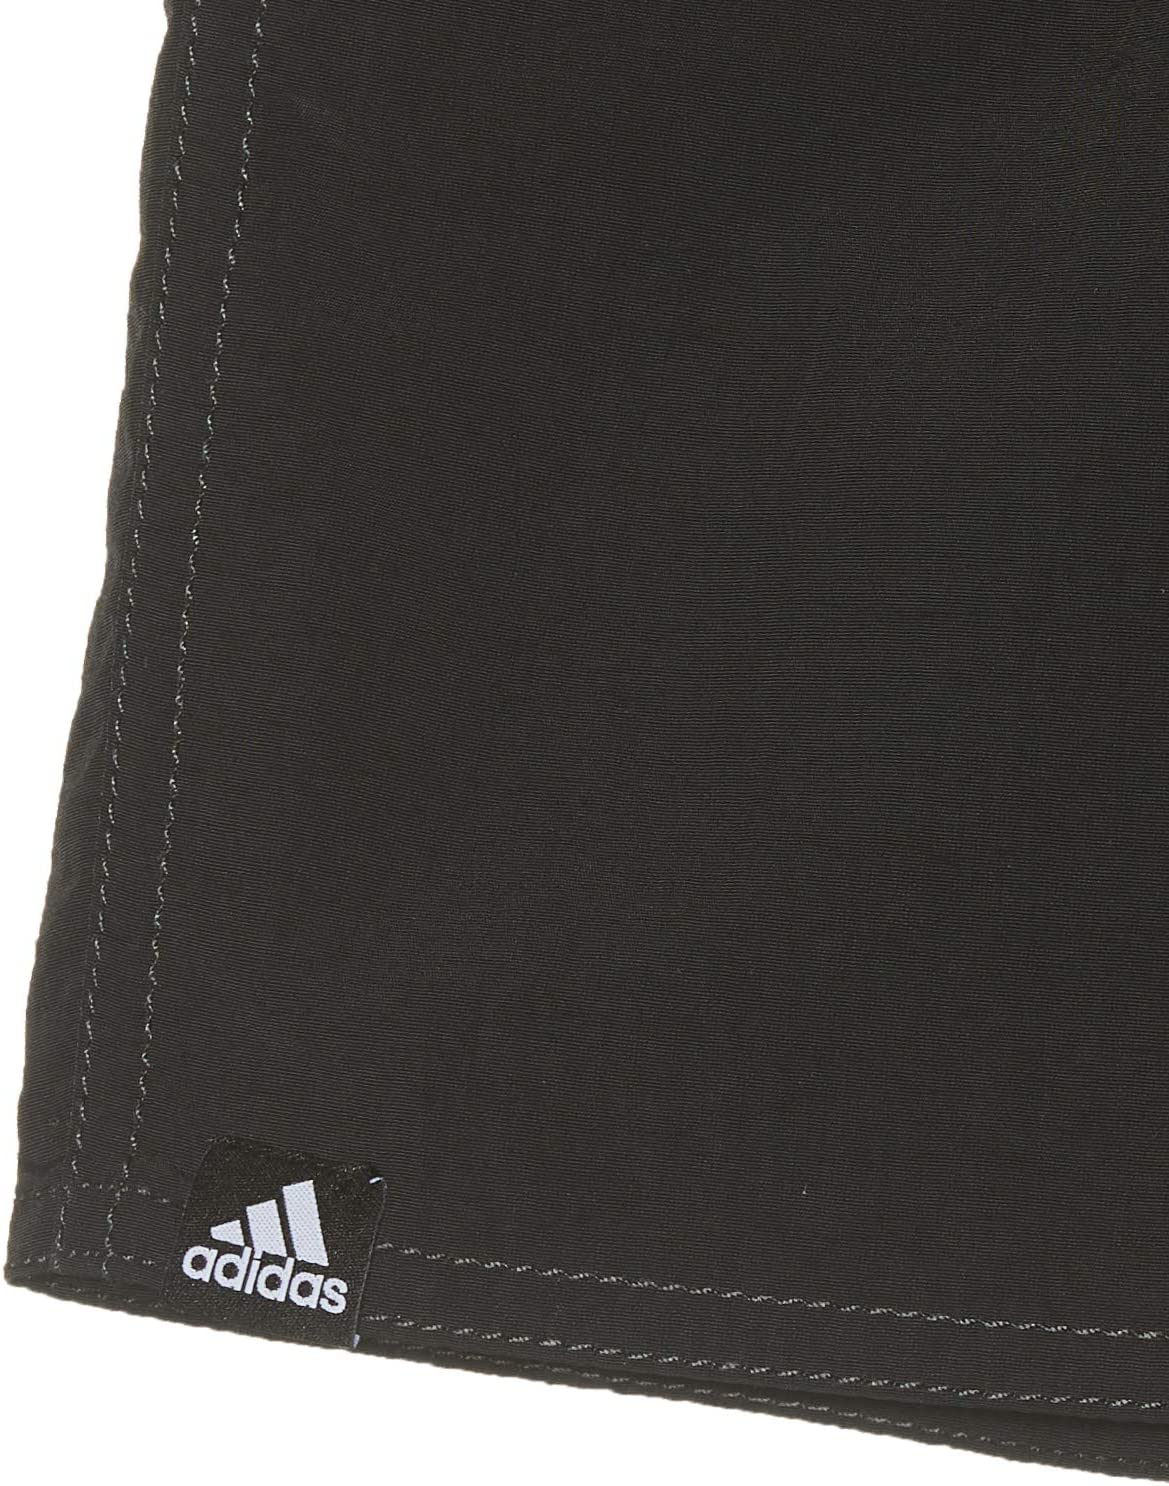 adidas Yb Lin CB T T-Shirt Gar/çon